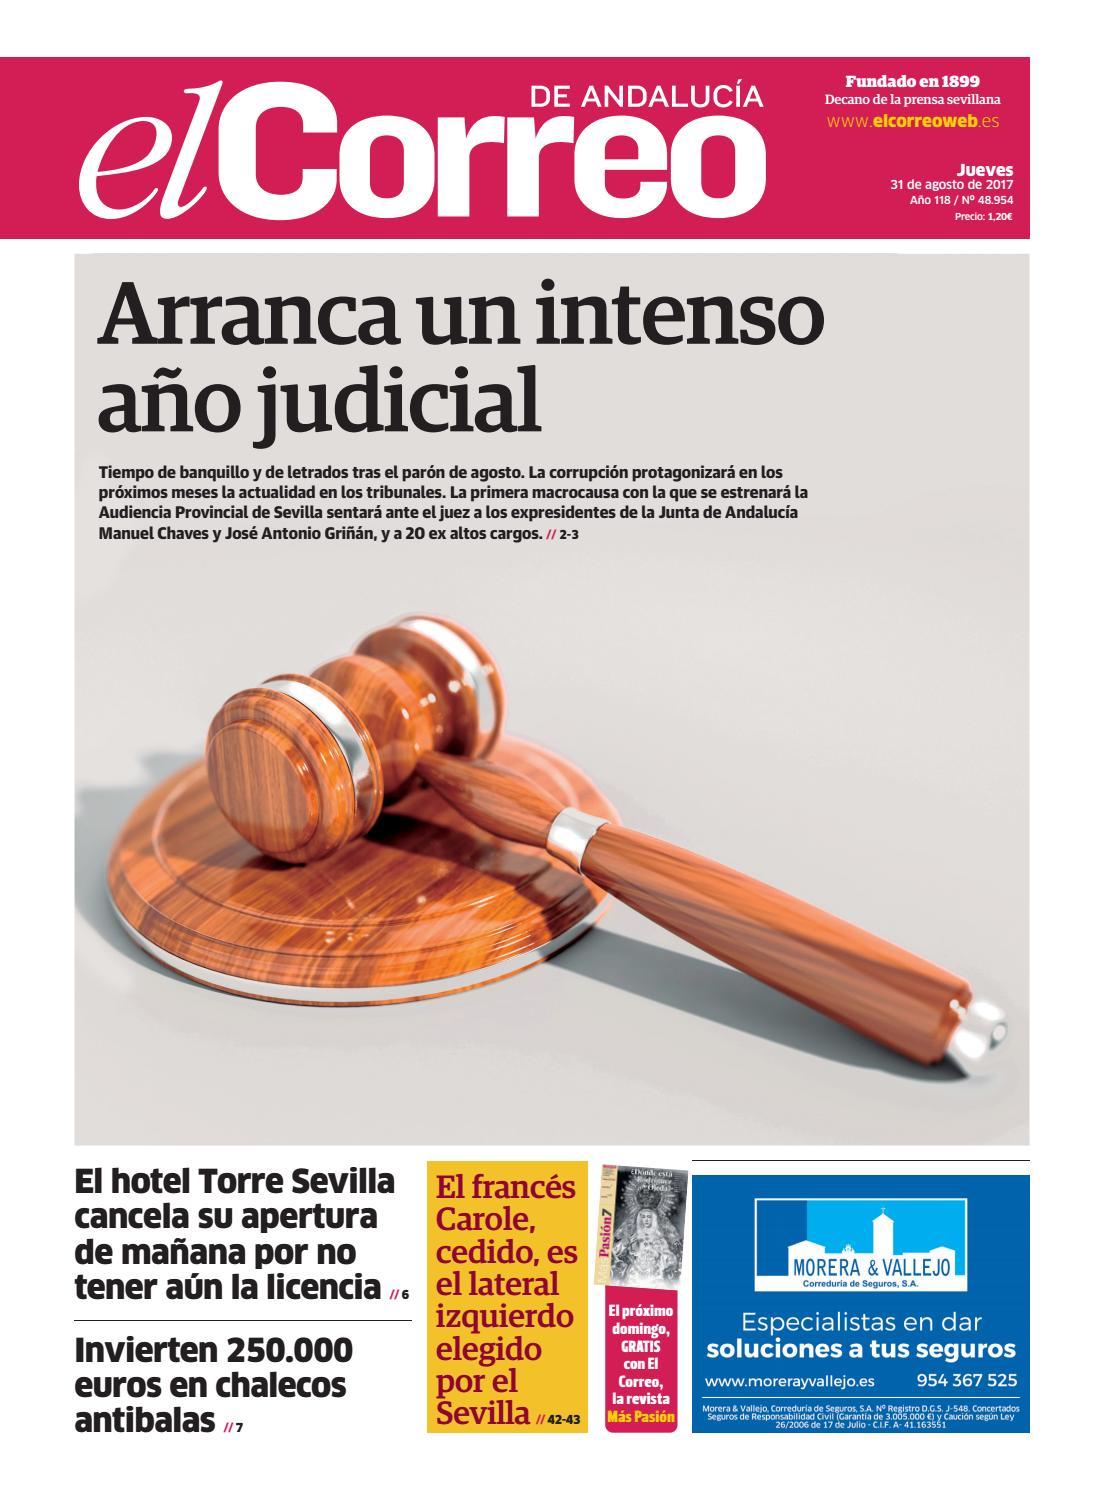 31 08 2017 El Correo De Andaluc A By El Correo De Andaluc A S L  # Muebles Caparros E Hijos